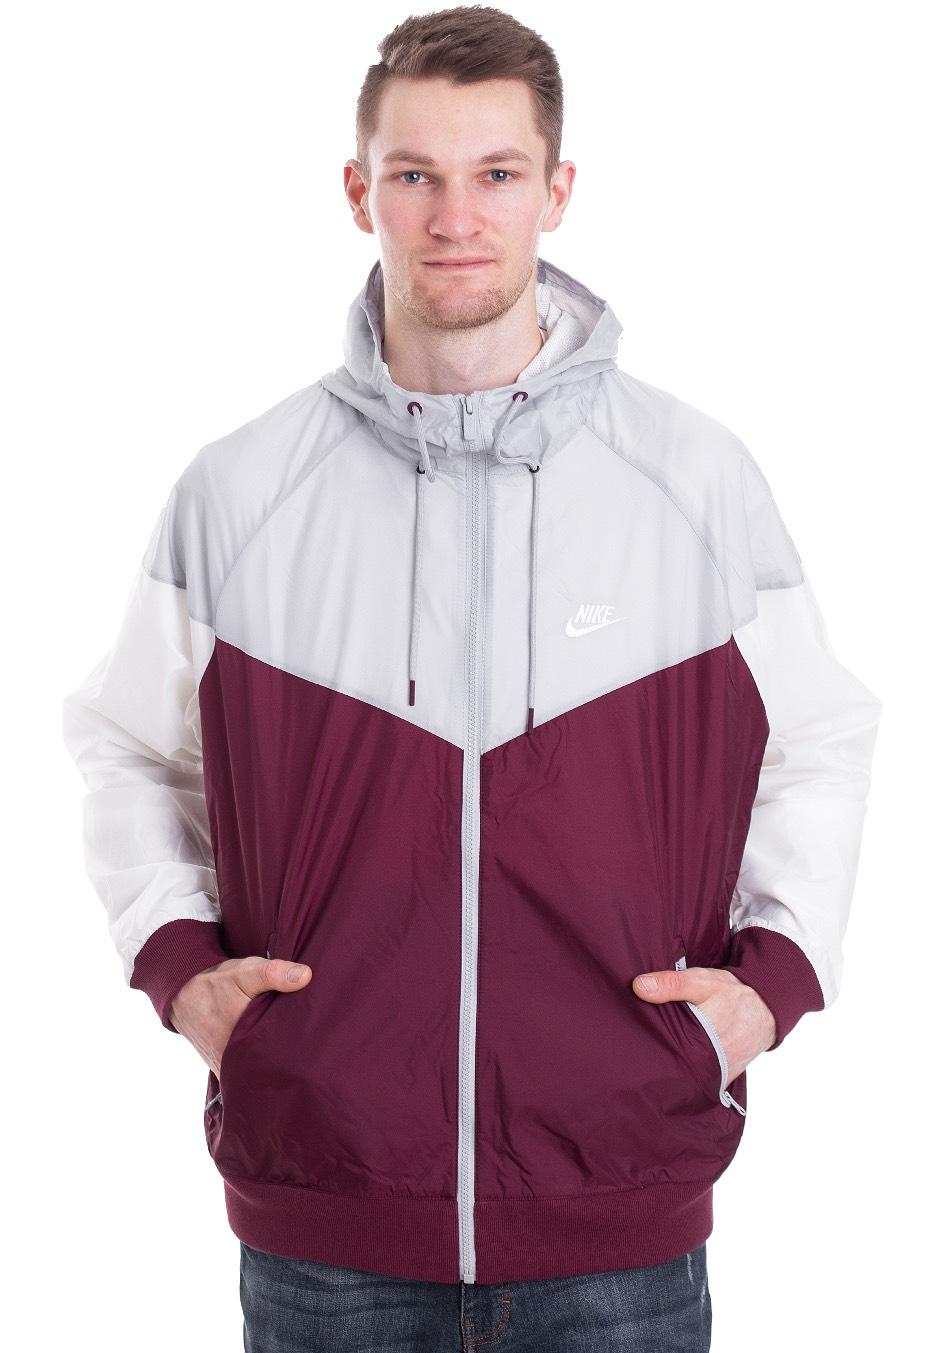 96551b94162 Nike - Sportswear Windrunner Night Maroon/Wolf Grey/Sail/Sail - Windbreaker  - Streetwear Shop - Impericon.com US